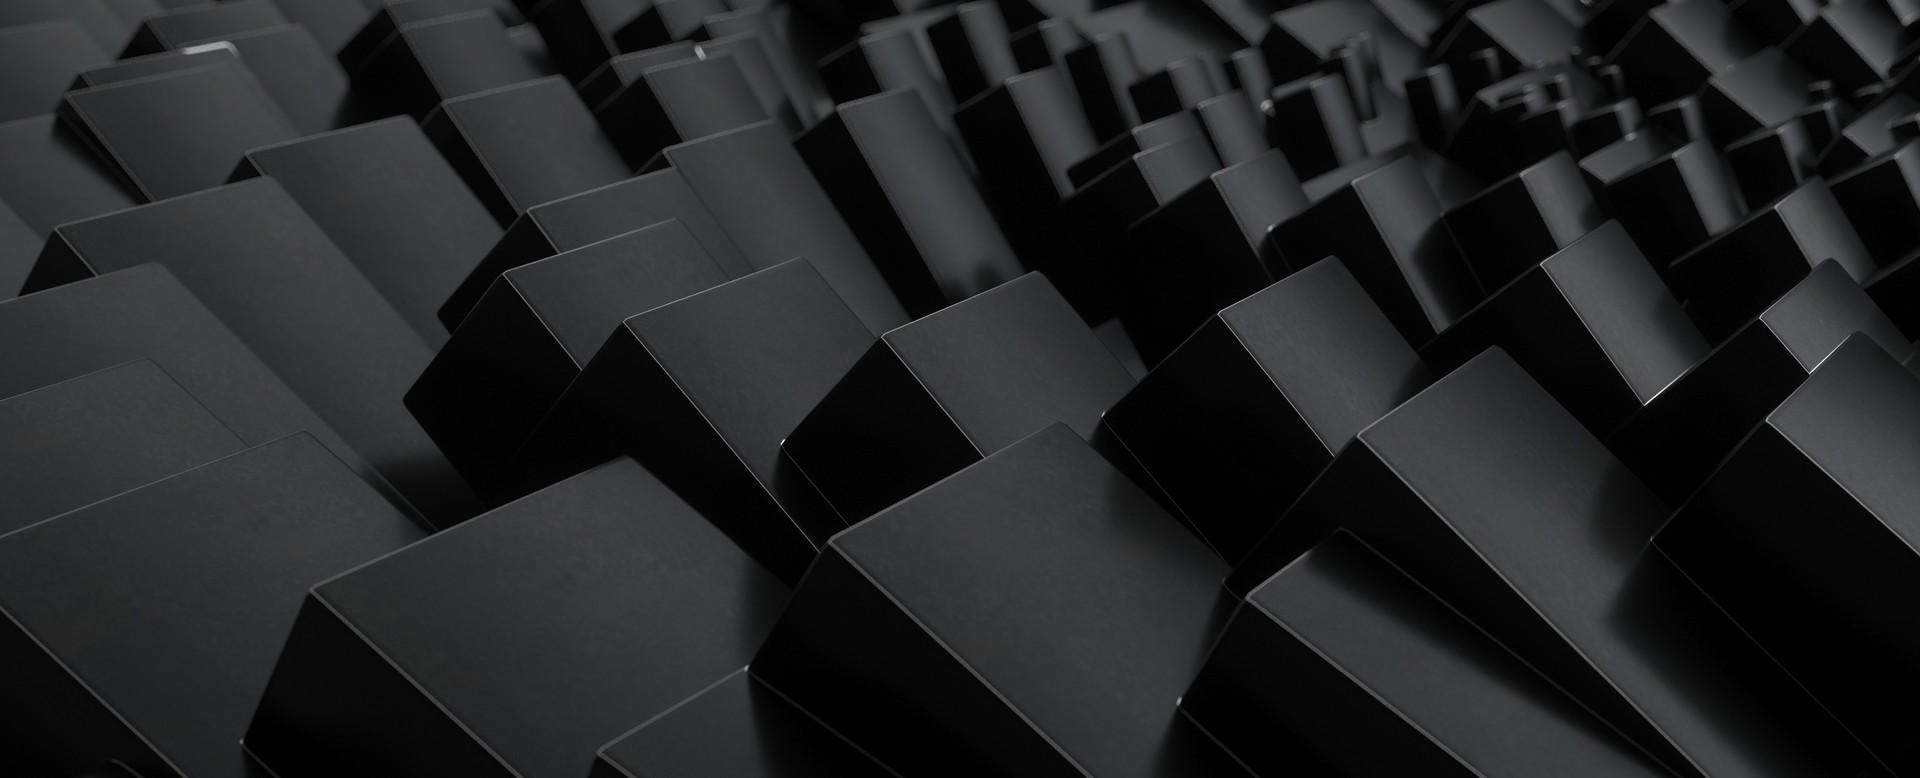 Kresimir jelusic robob3ar 494 abstract box 22